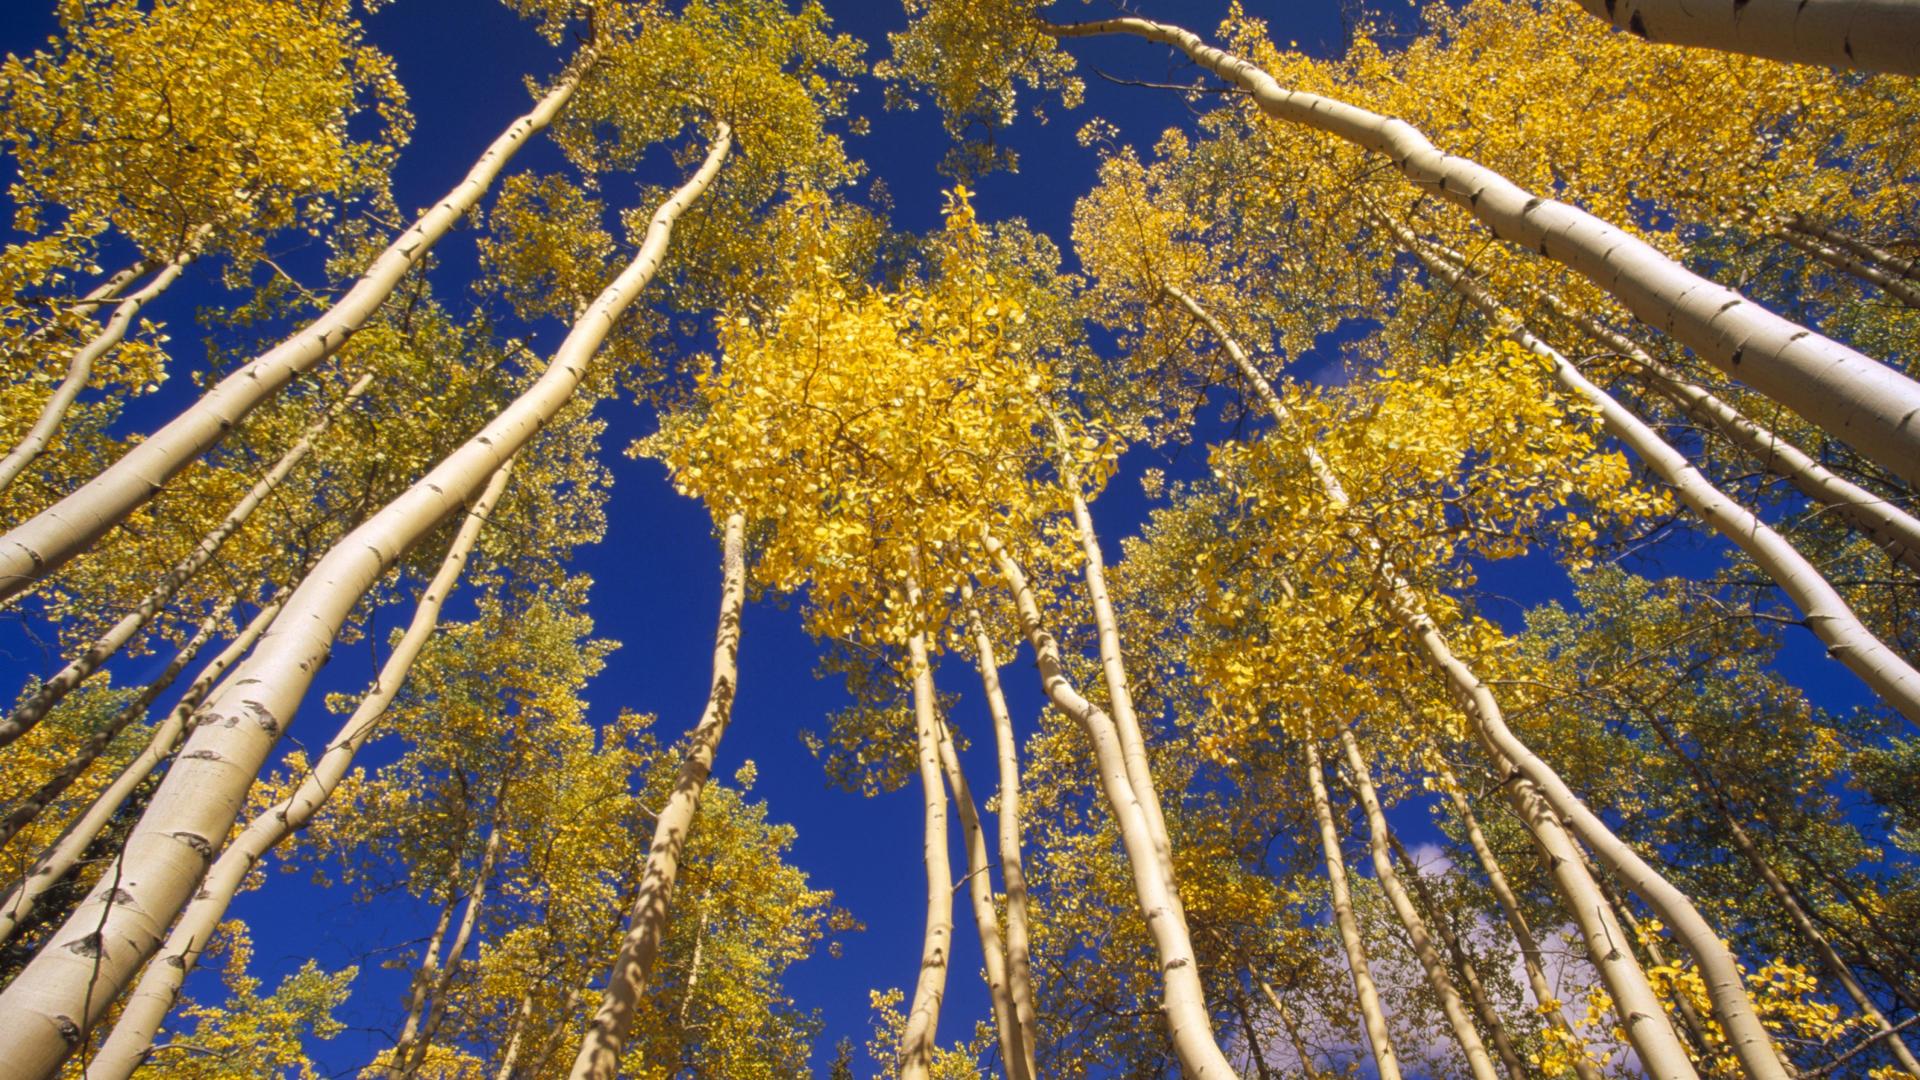 Fall Wallpaper Screensavers Forest Wallpaper Trees Hd Desktop Wallpapers 4k Hd